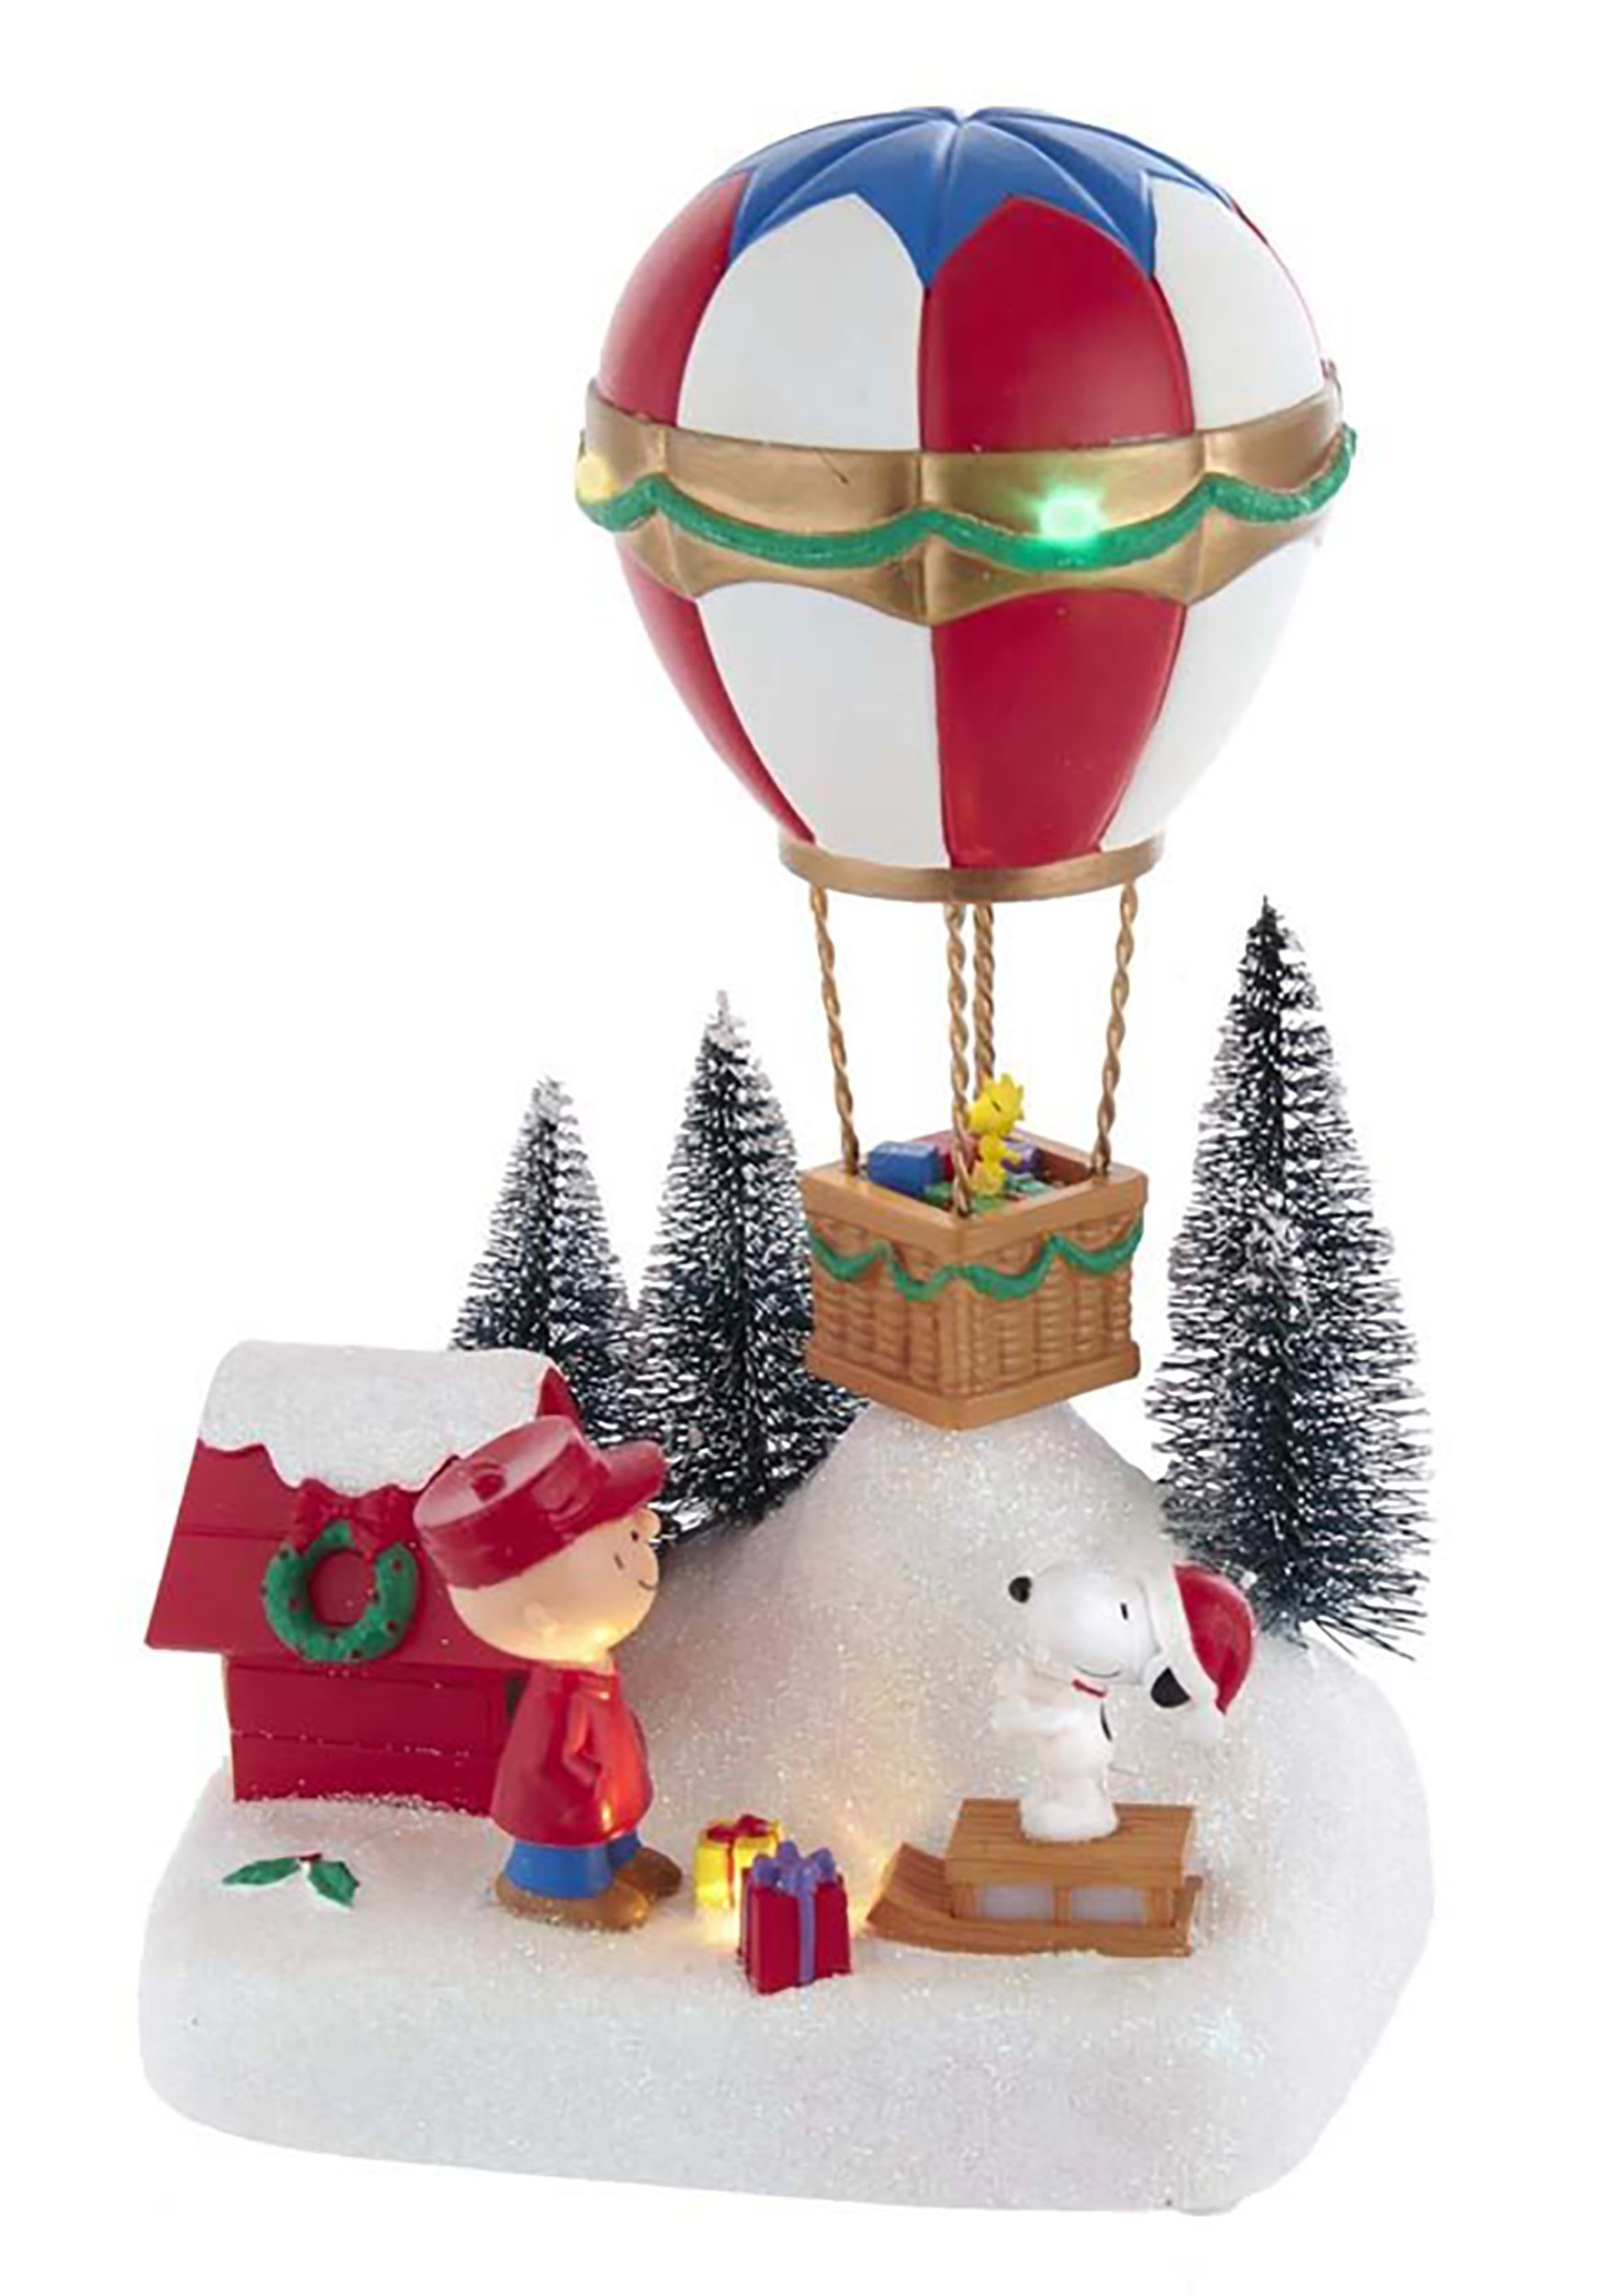 Kurt Adler Peanuts Animated Musical Hot Air Balloon Tablepiece